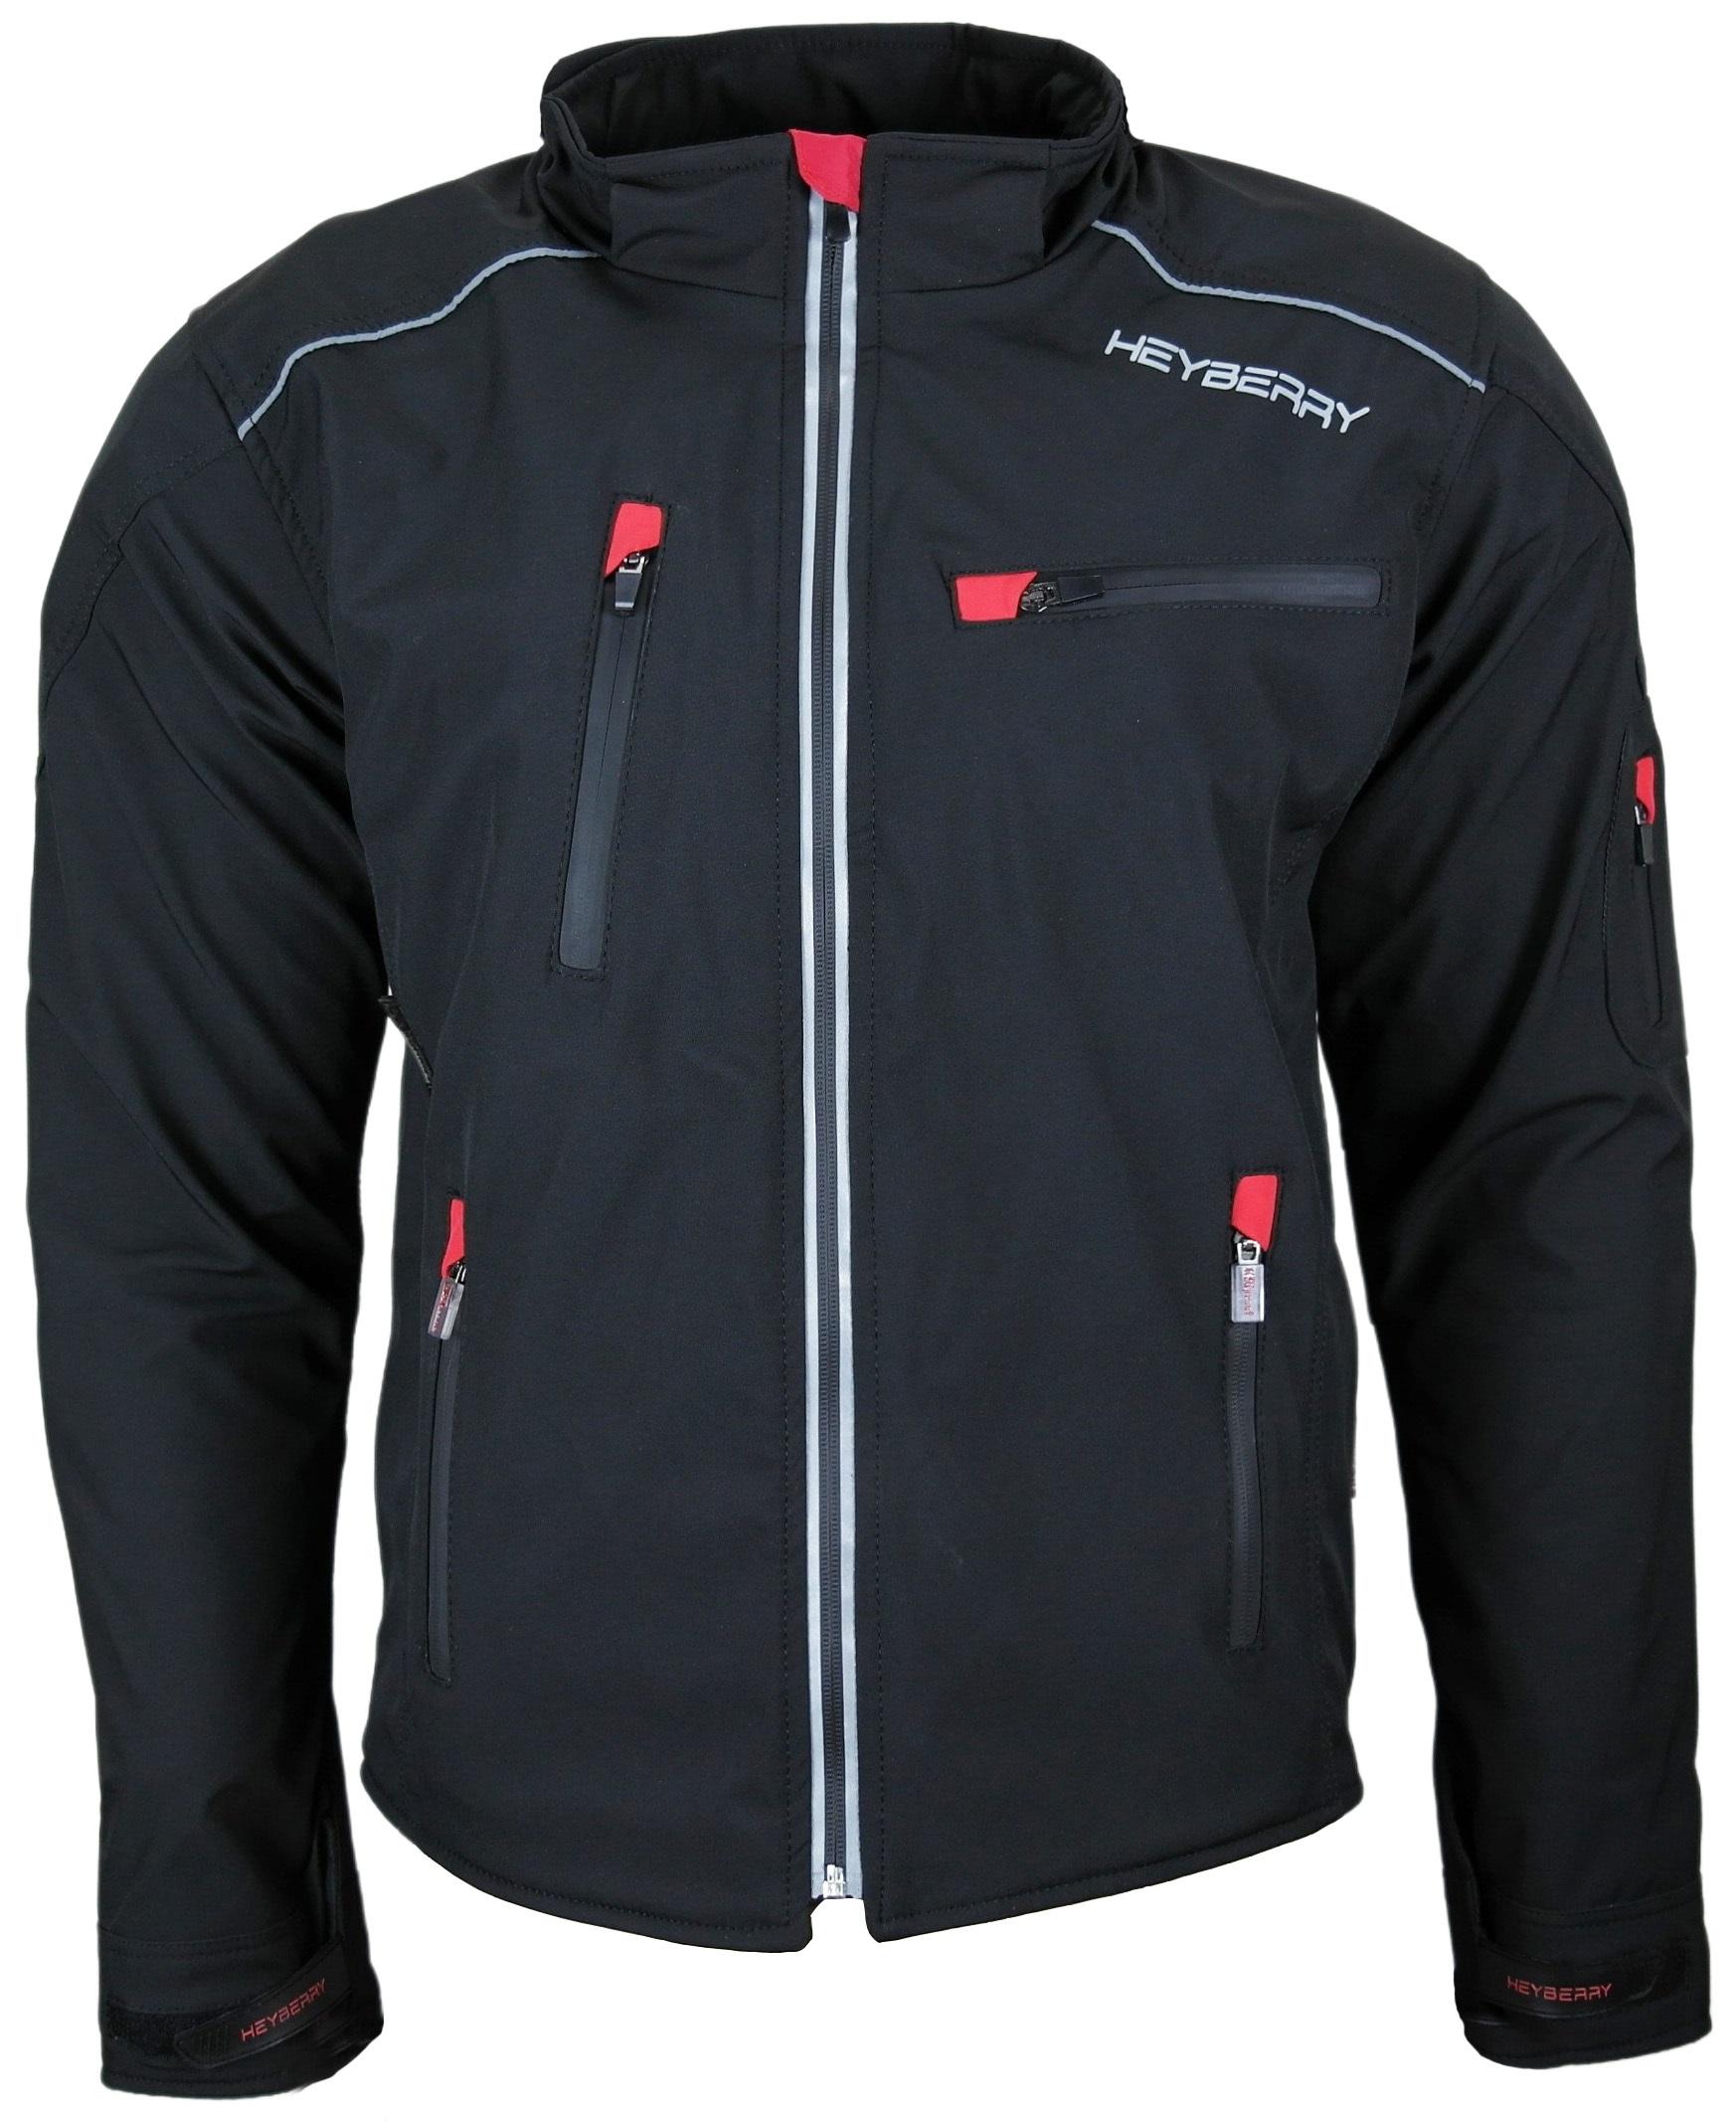 GrM Schwarz Soft Shell Motorradjacke Textil 7xl Heyberry 80OPXwkn